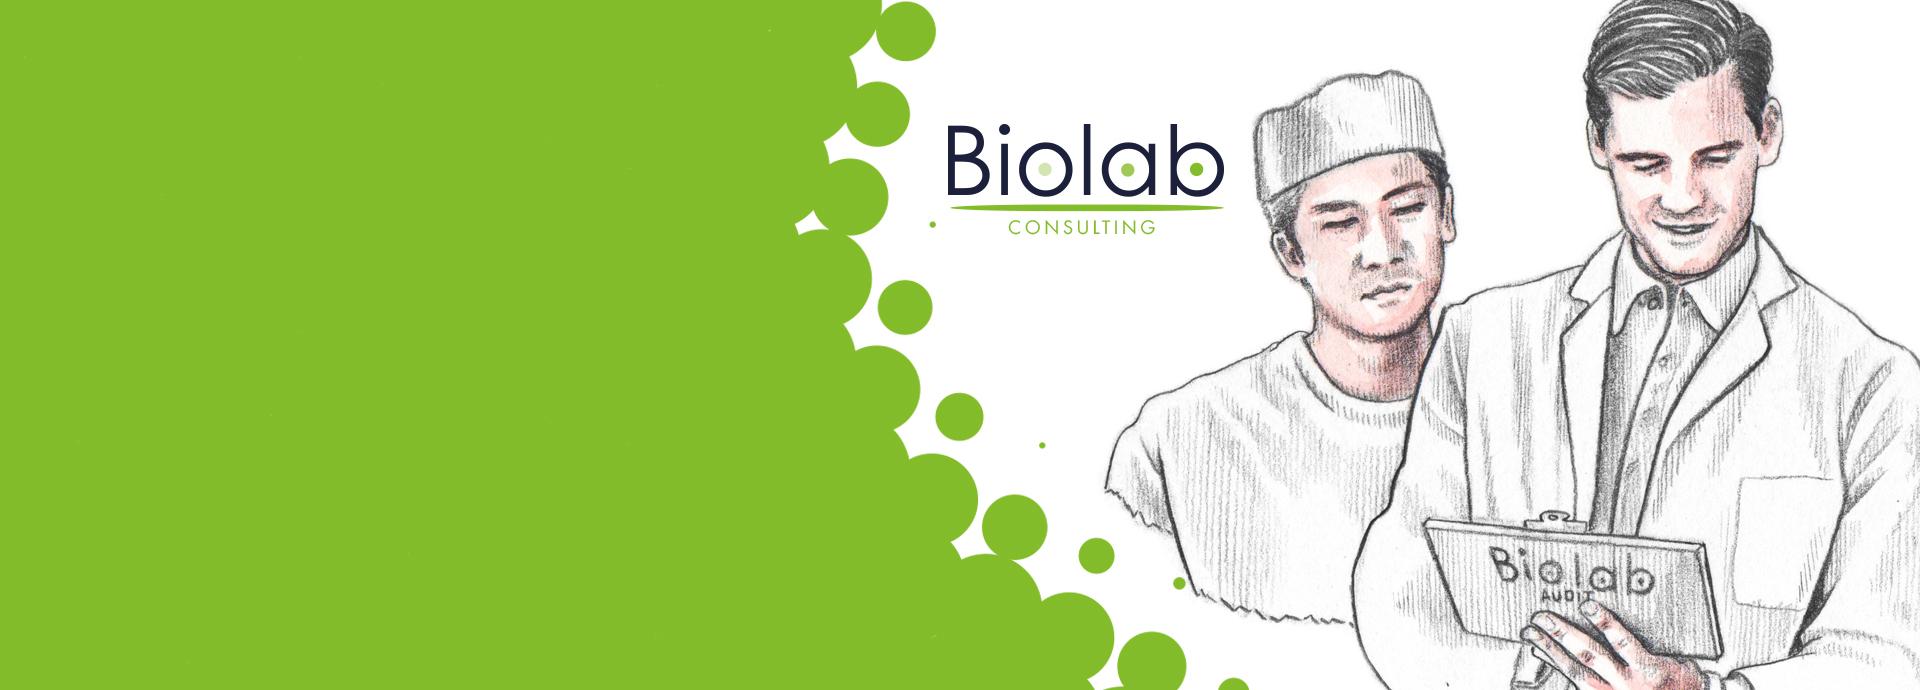 slider_biolab2_3